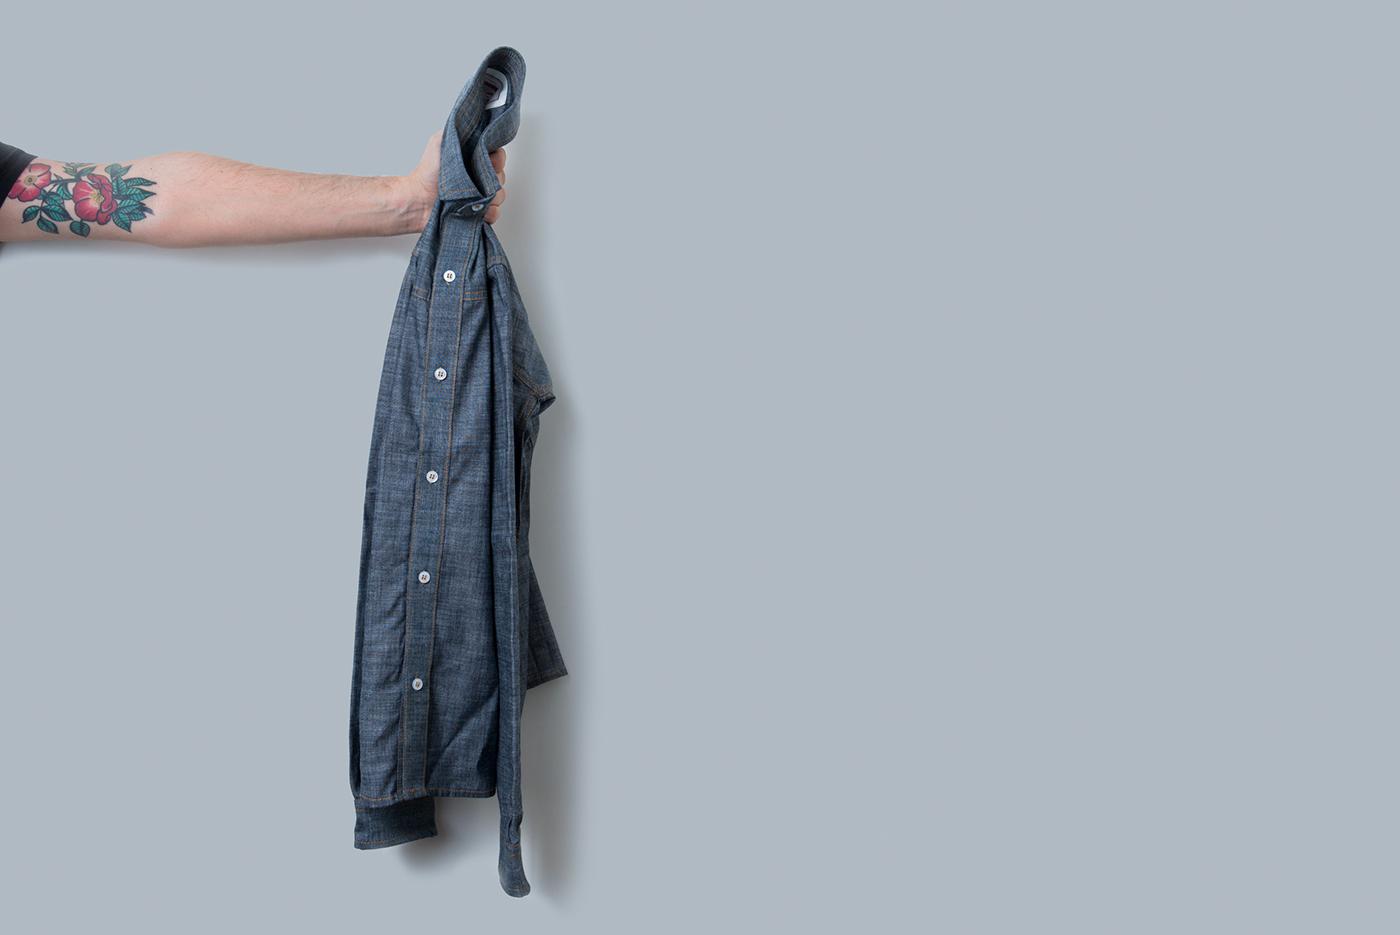 dion ochner worker 12 - Dion Ochner lança jaquetas e camisas Worker